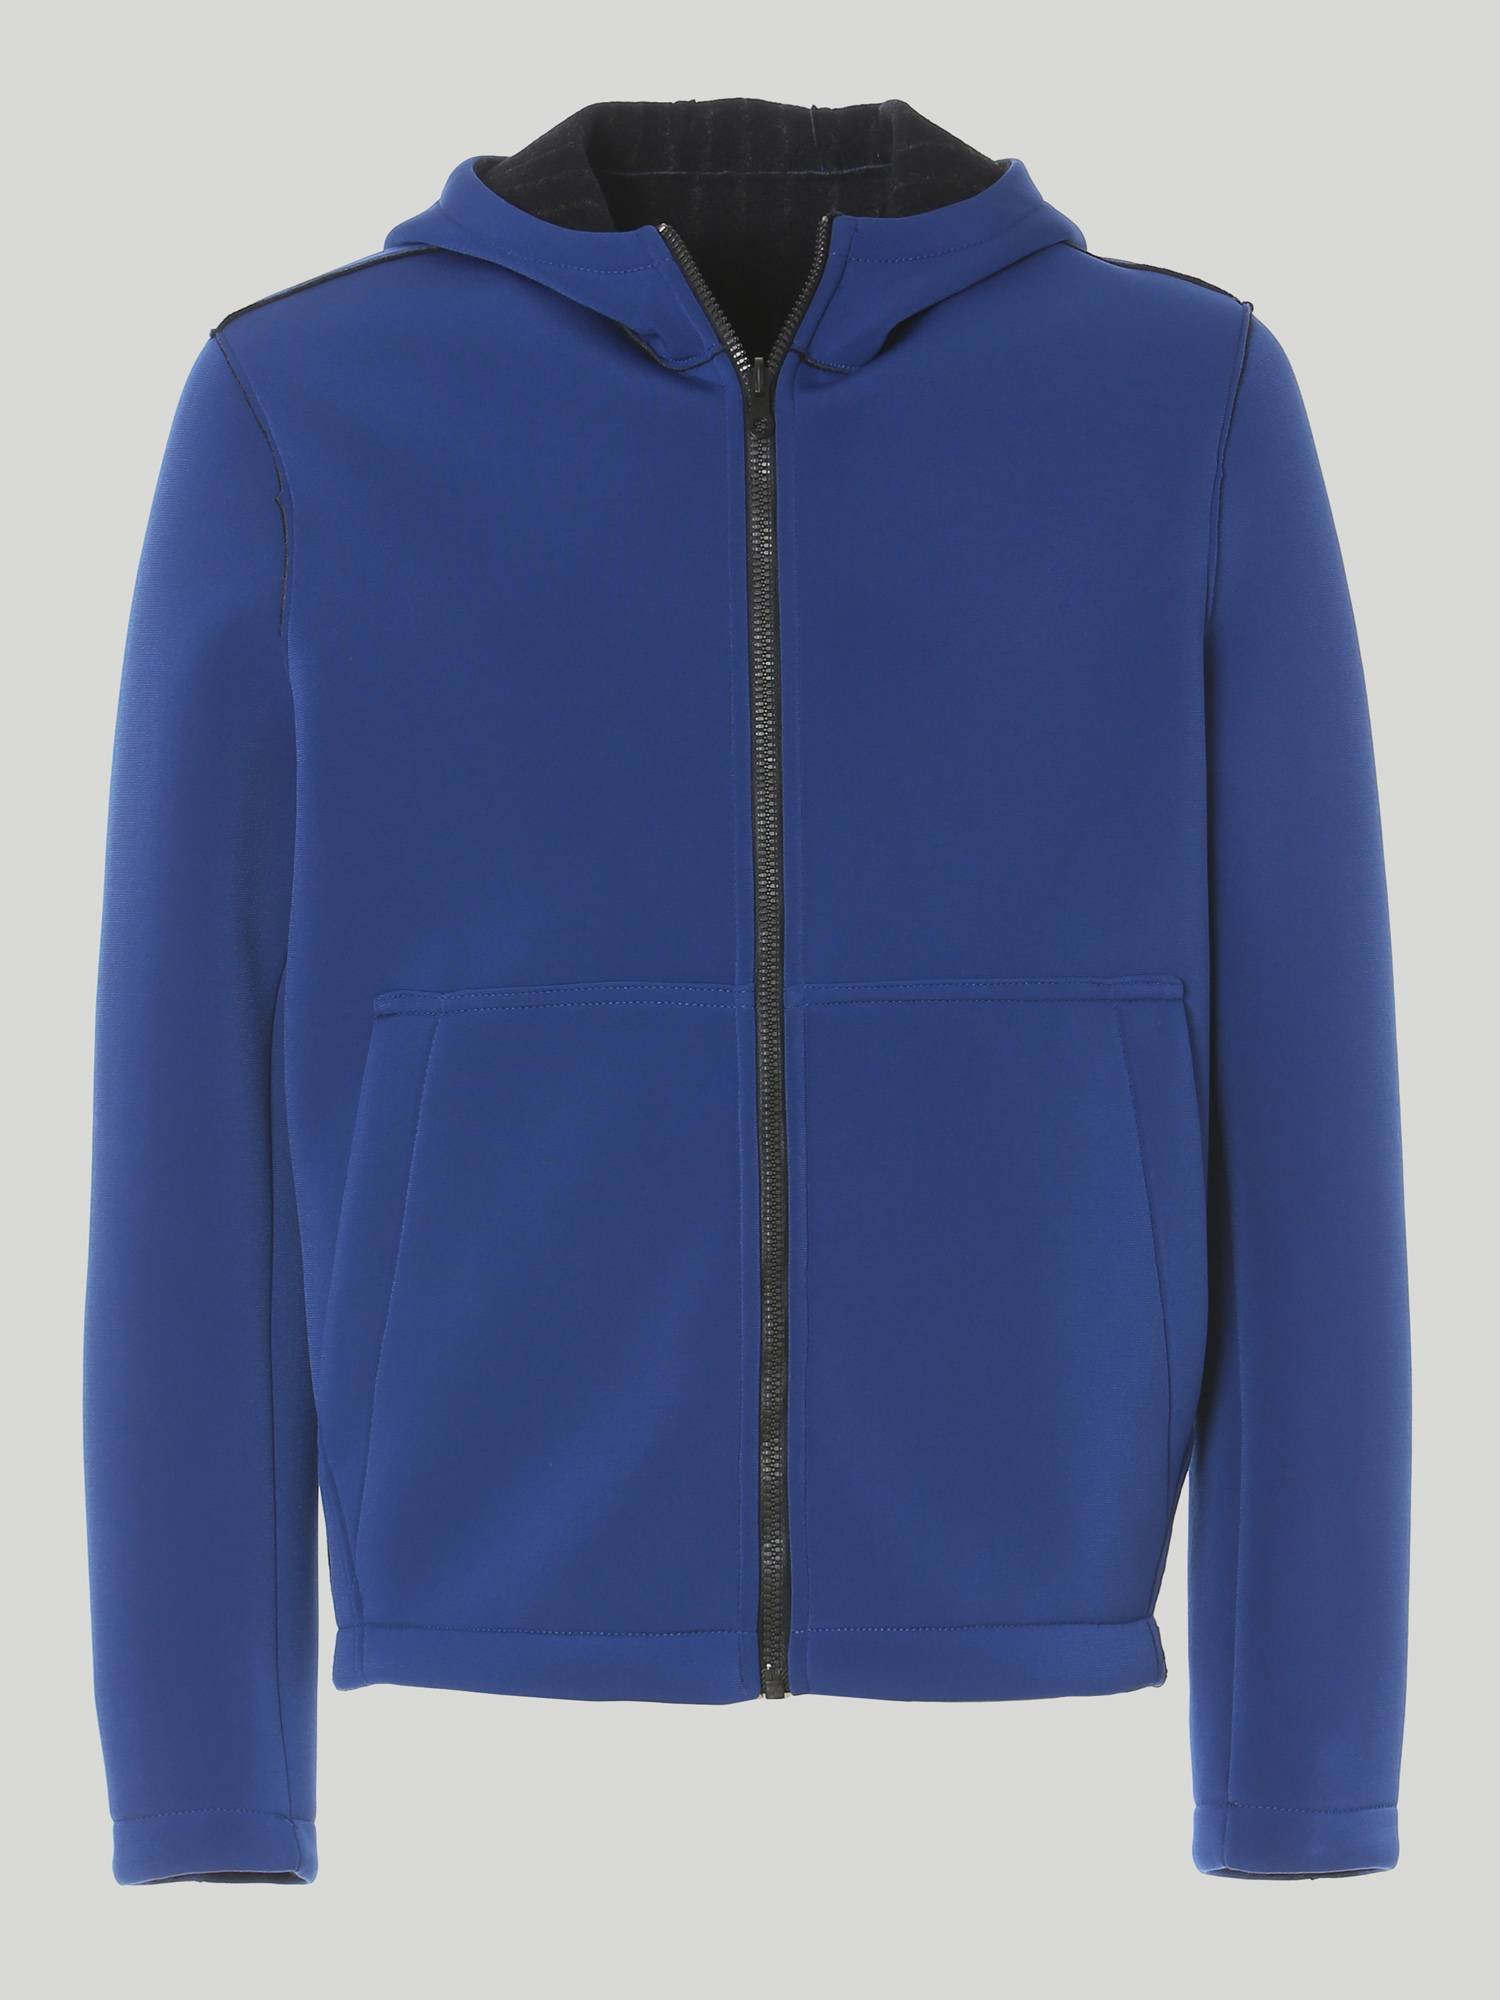 Drabber jacket - Navy Blue